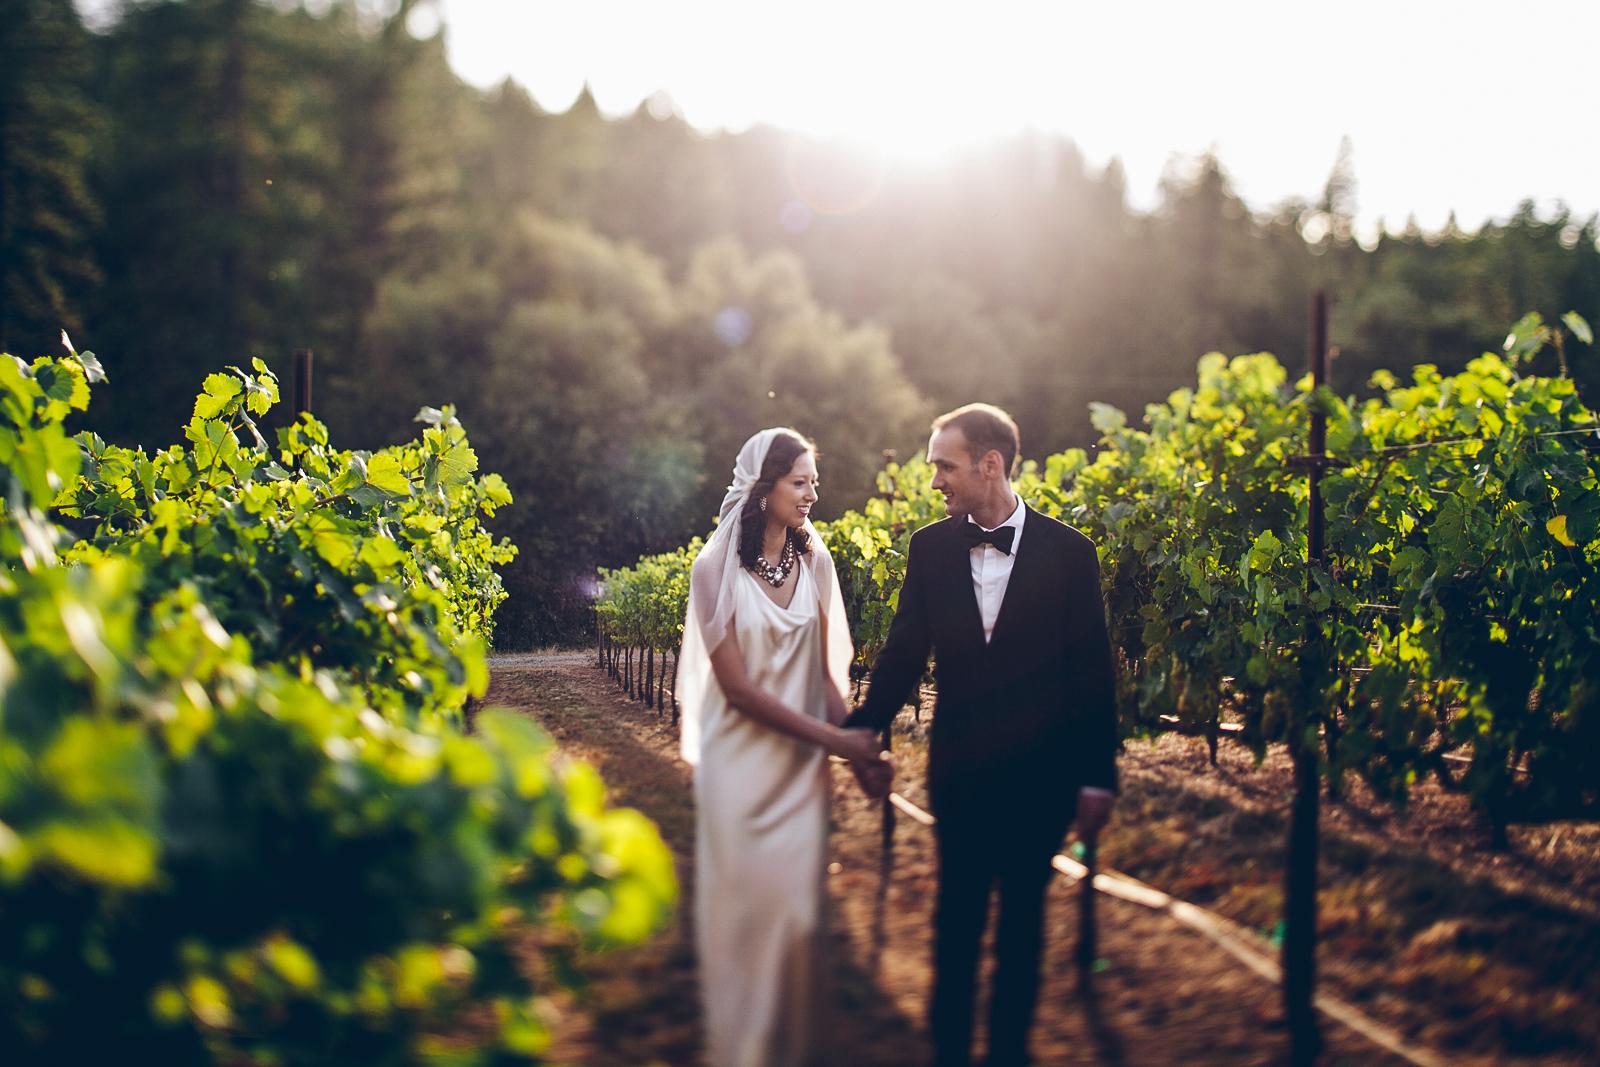 miraflores_winery_wedding_photography_ian_melissa_ebony_siovhan_bokeh_photography_52.jpg